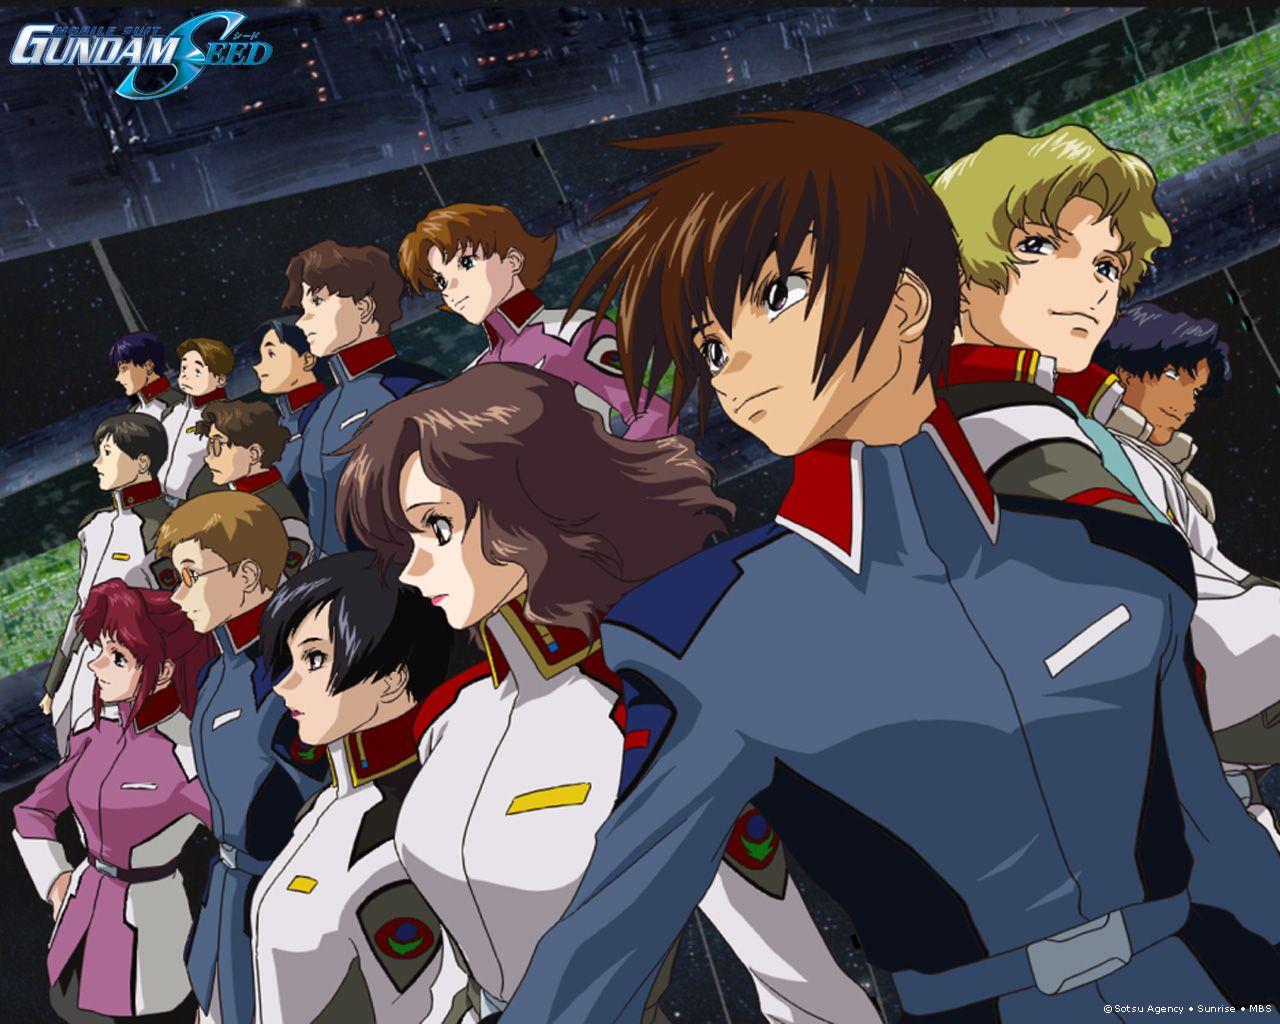 Анонс HD версии «Gundam Seed»